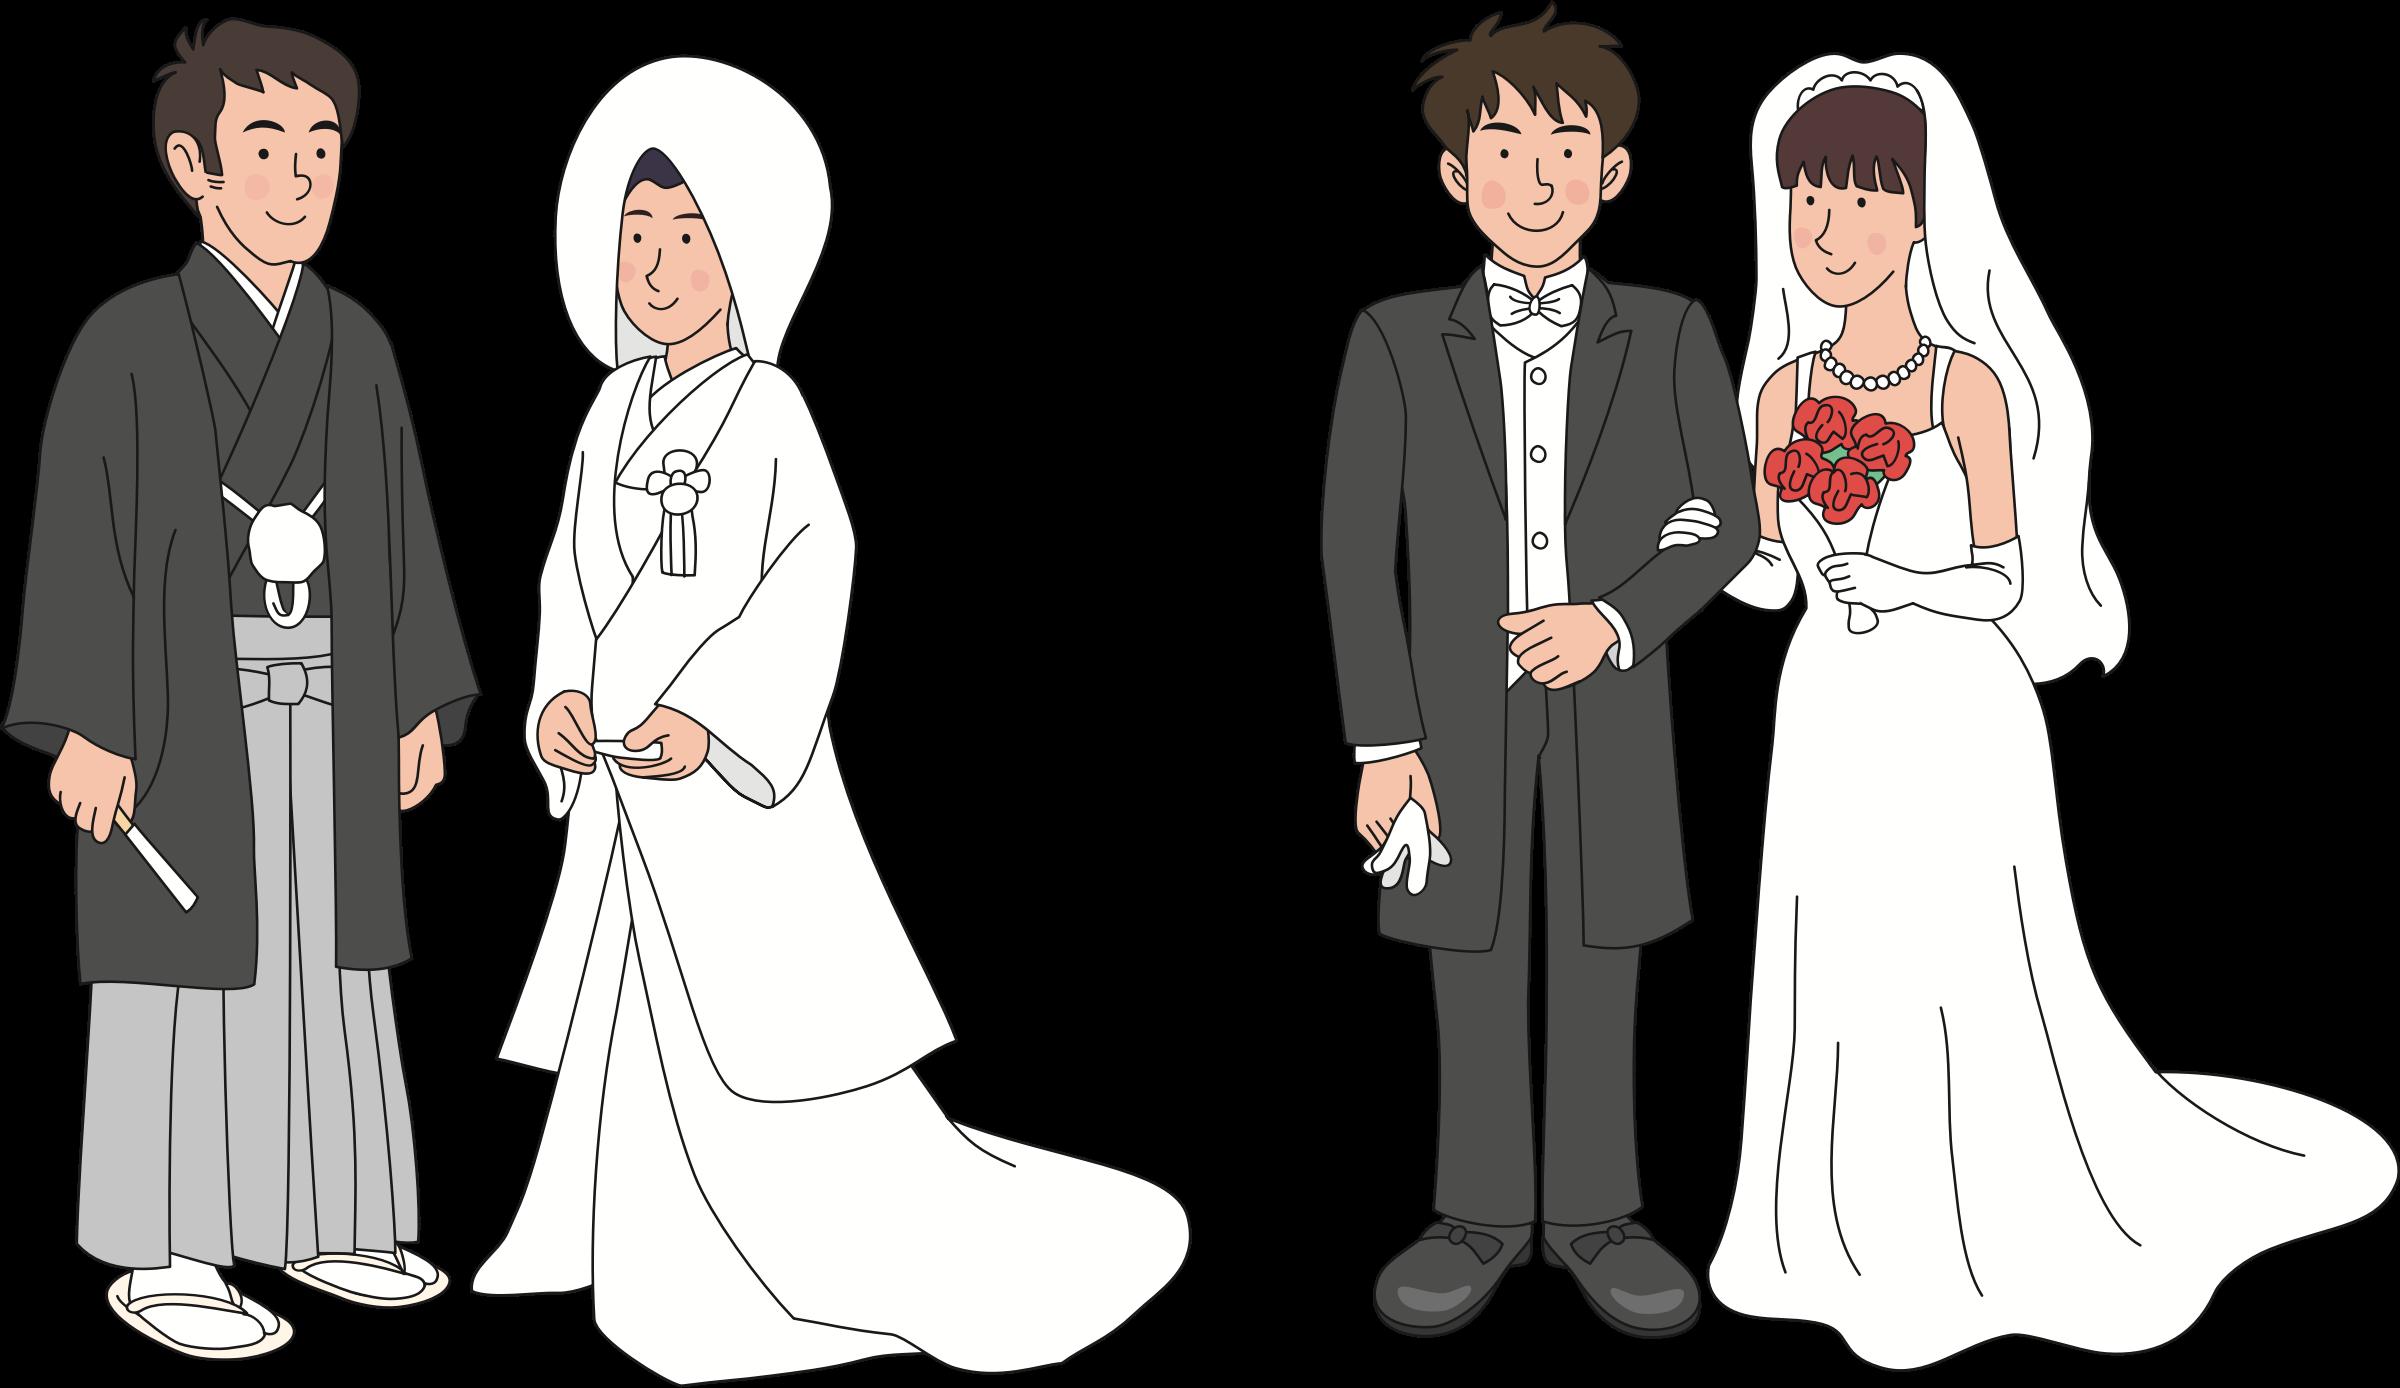 Japanese wedding big image. Japan clipart tradition japan